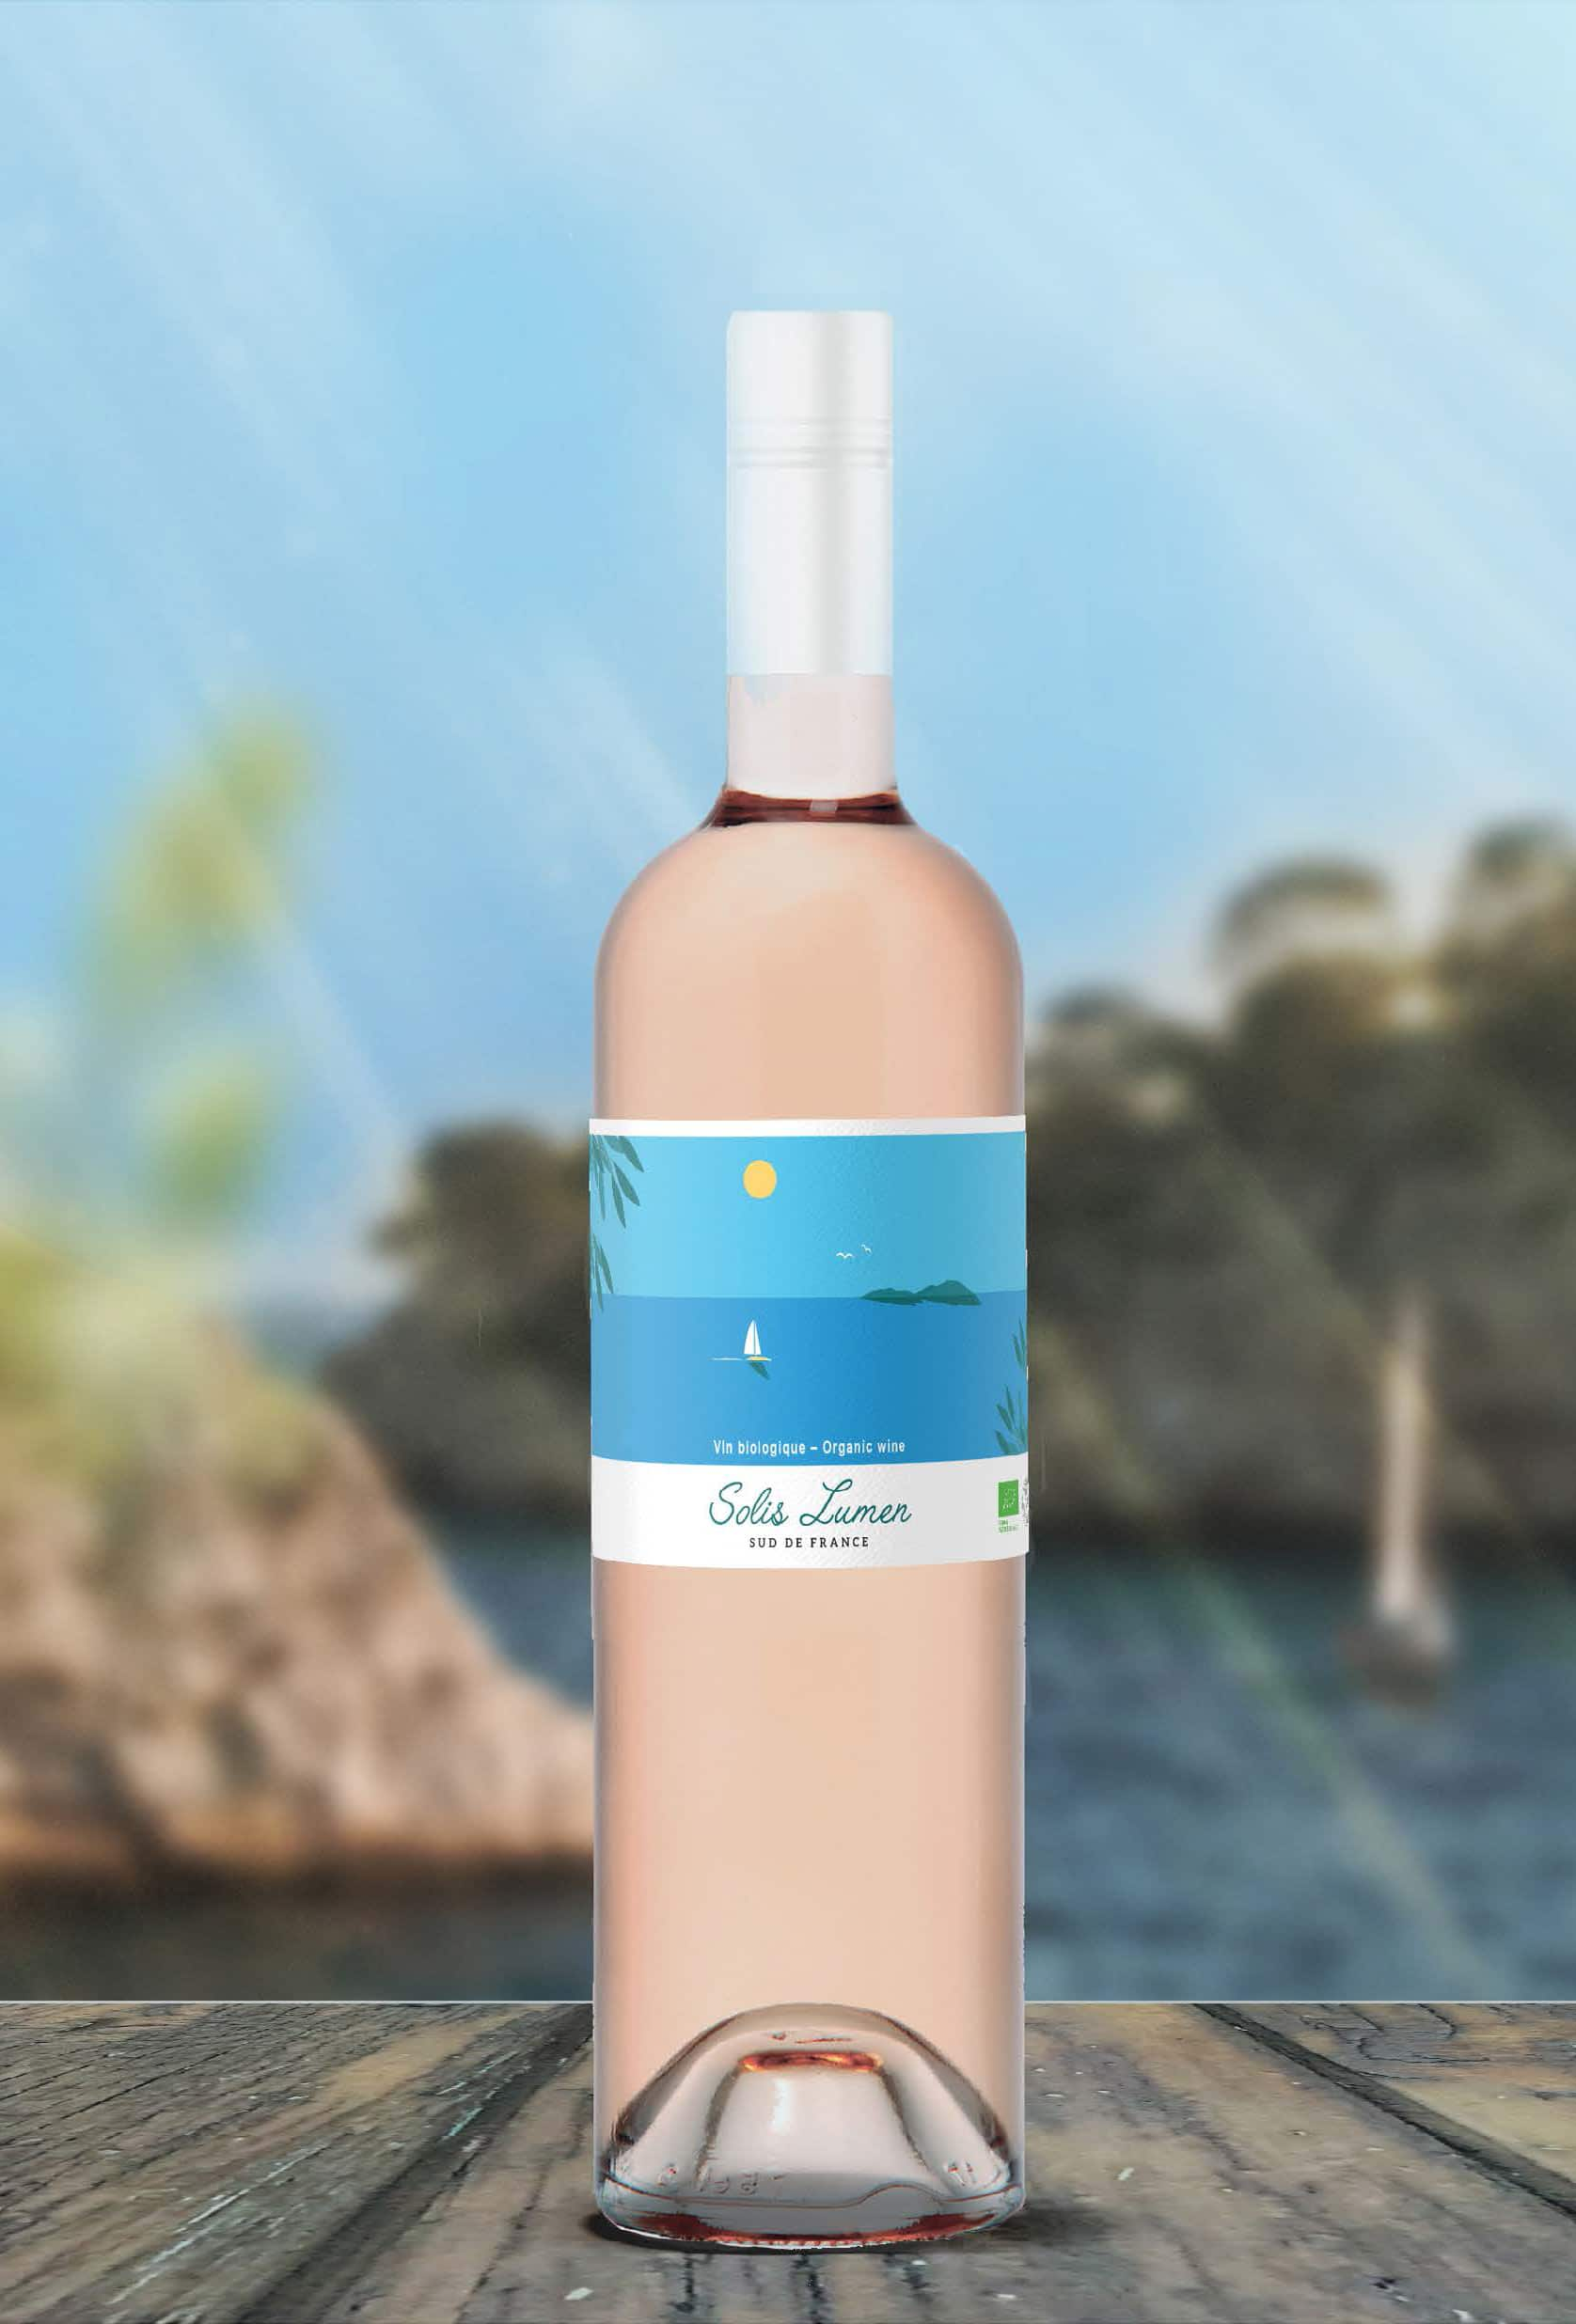 Gamme de vins Solis Lumen